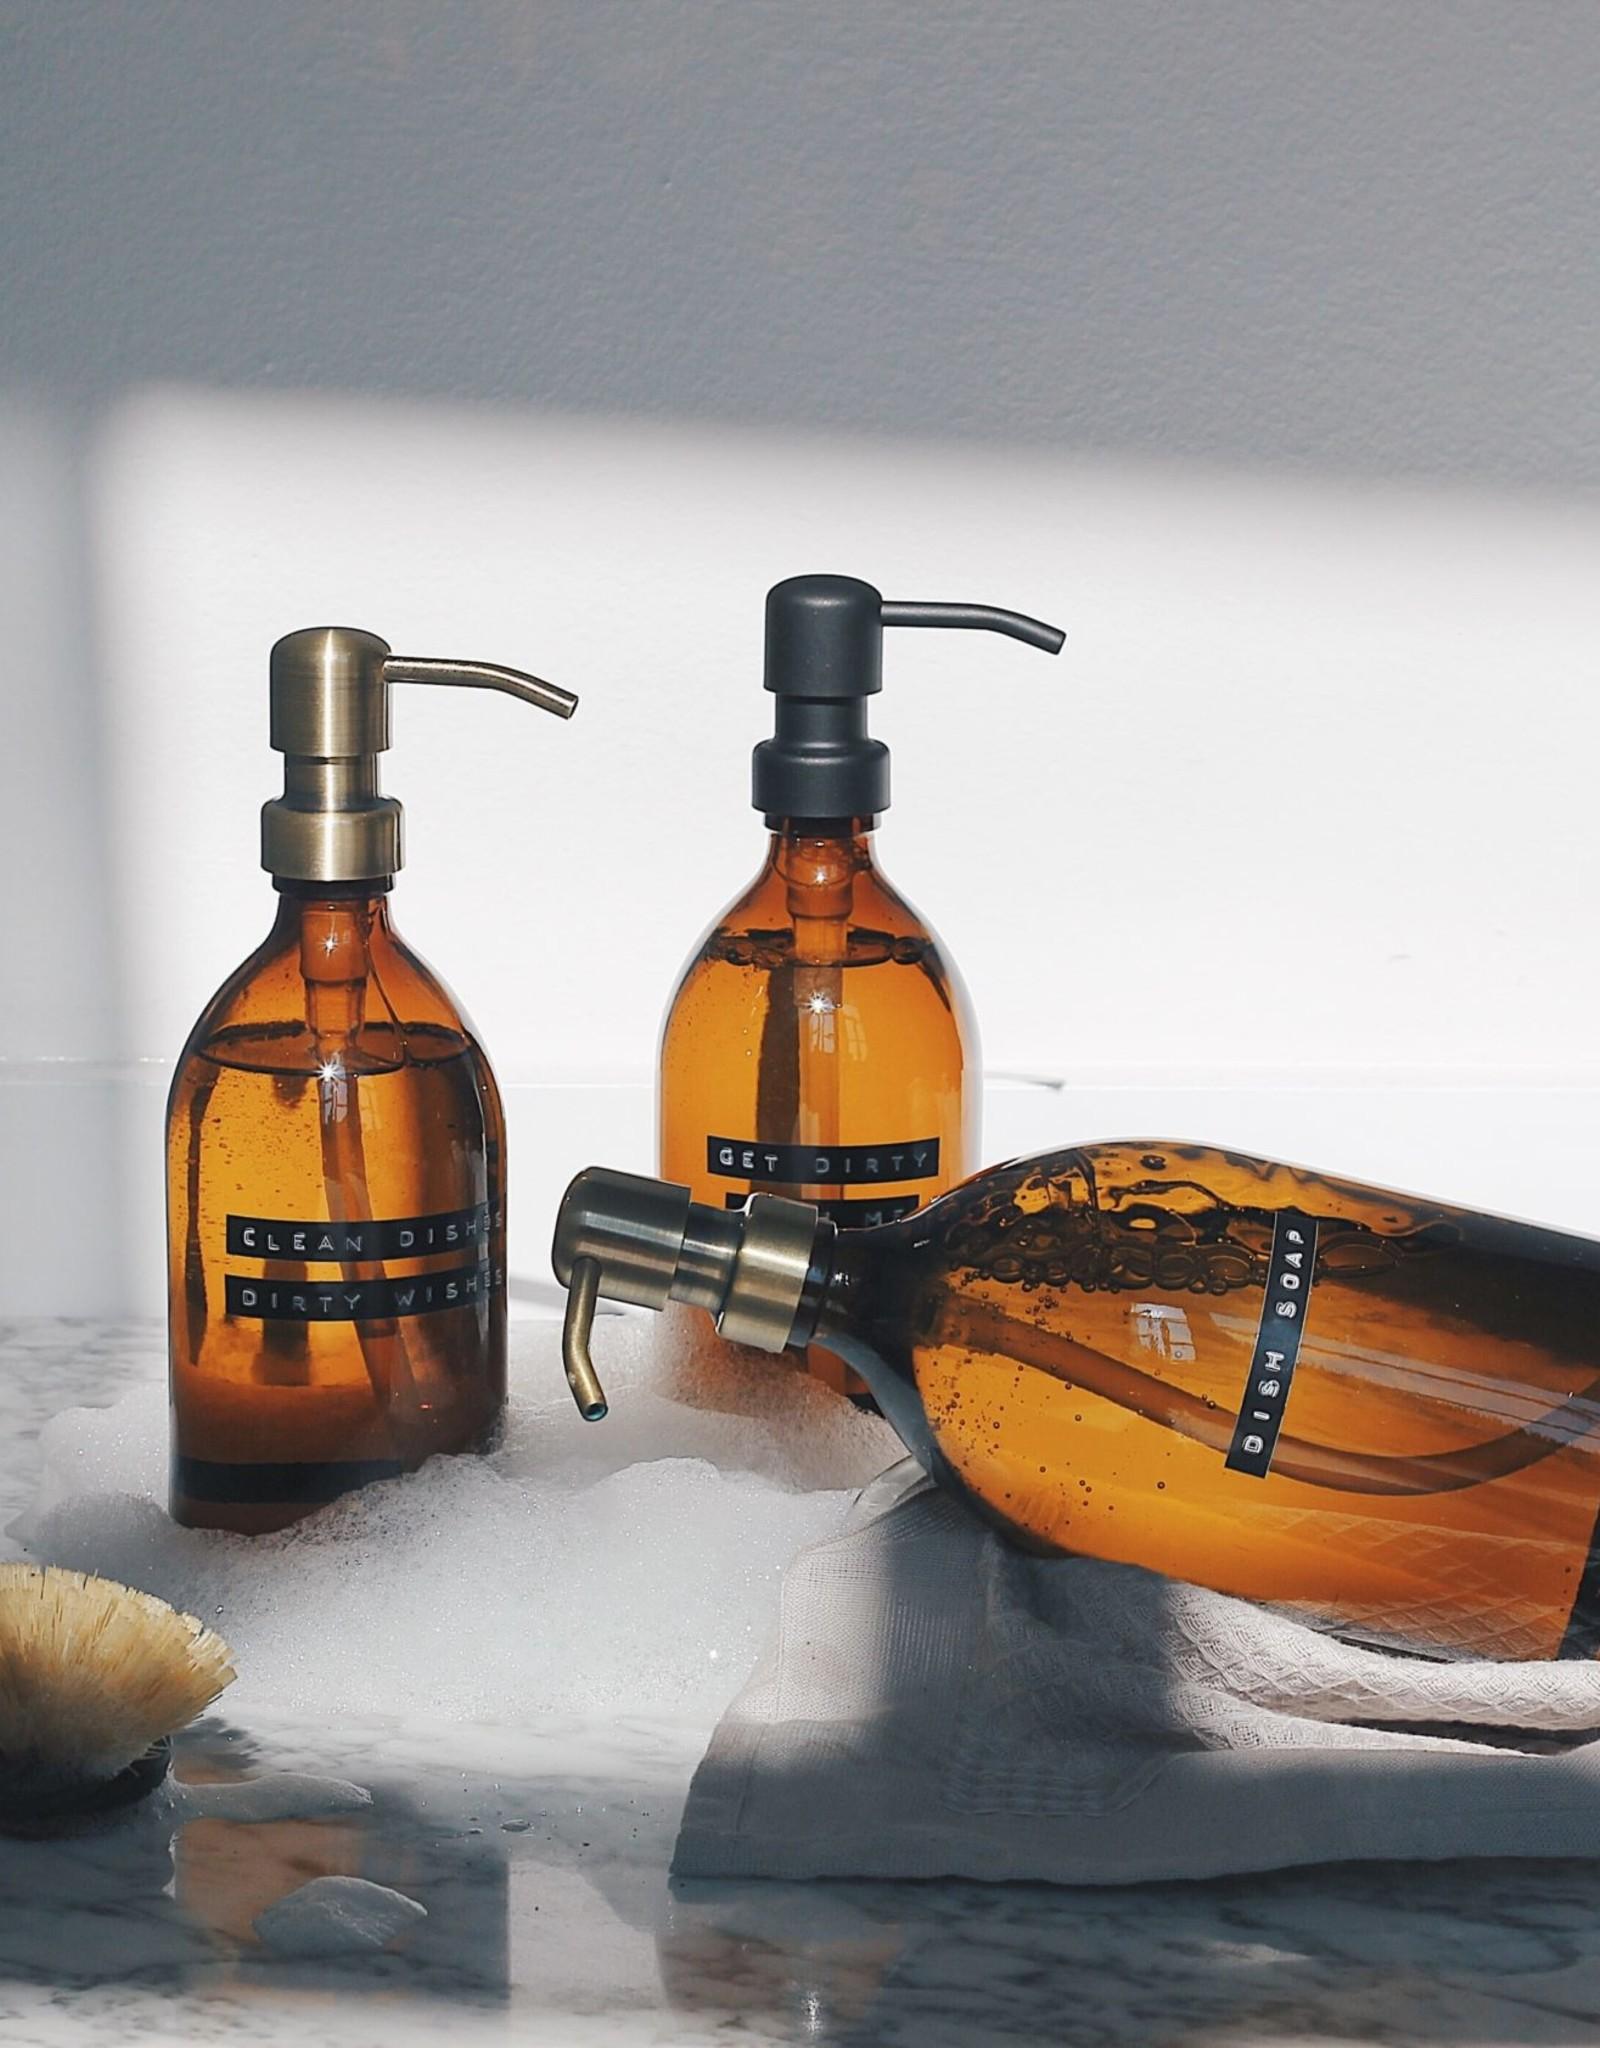 Wellmark Afwasmiddel bruin glas /messing pomp 500ml-dish soap